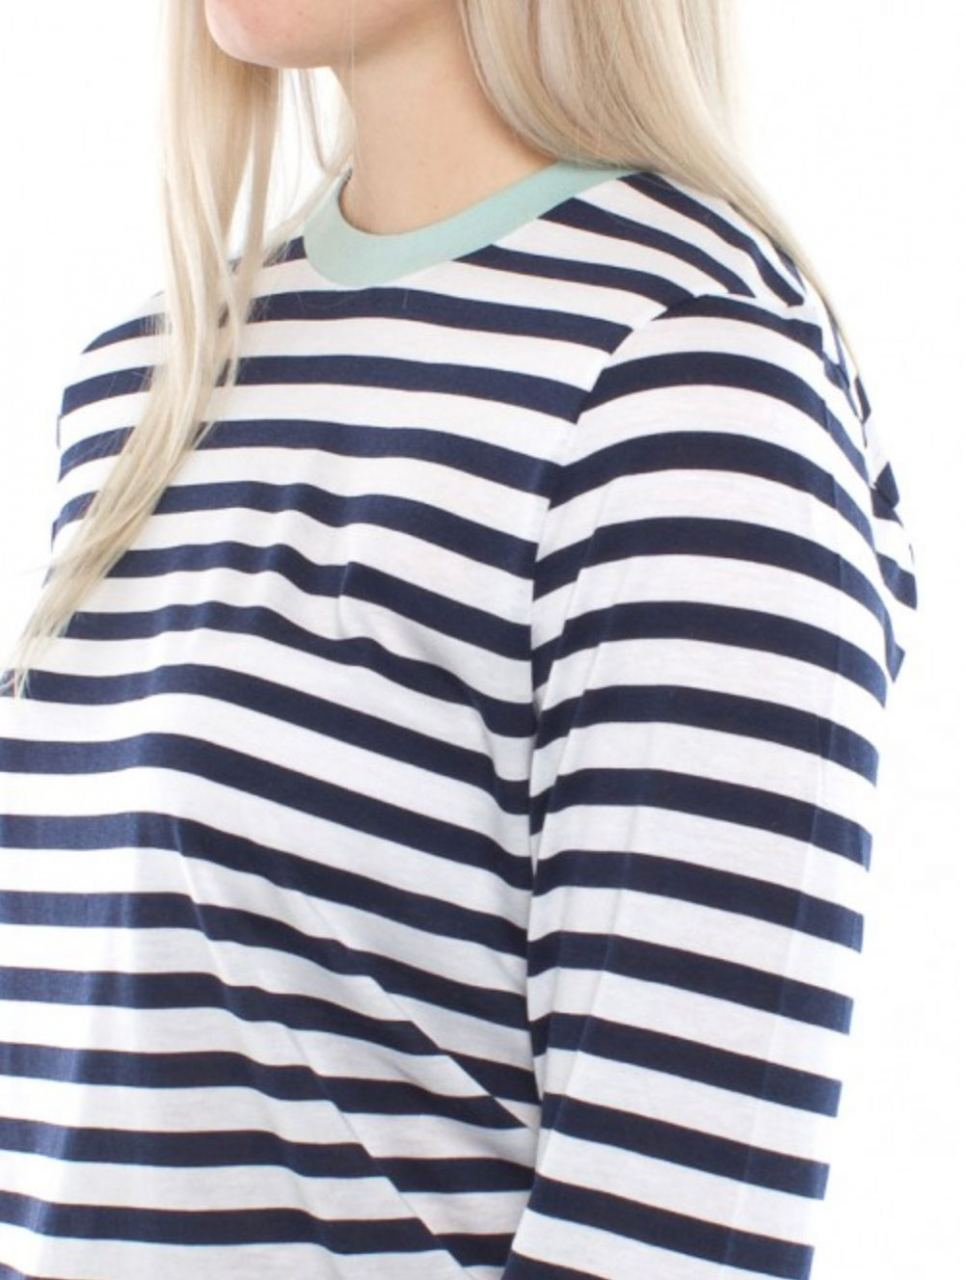 Tilse Longsleeve Aquagrey/Stripe